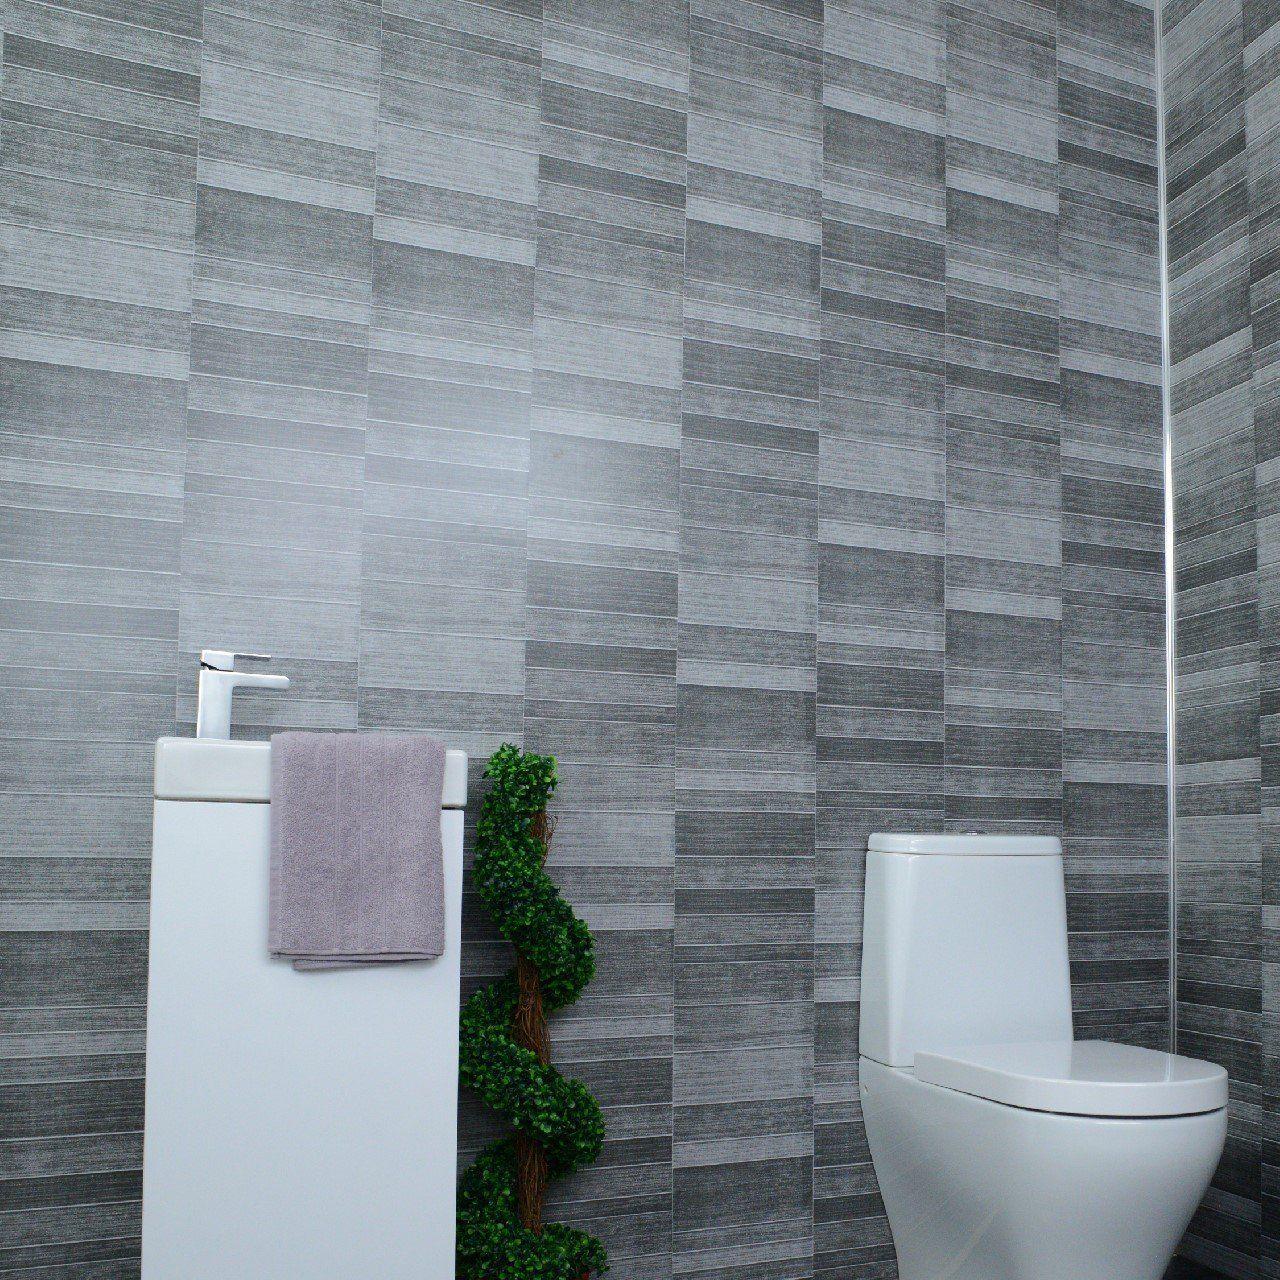 Dark Grey Bathroom Wall Panels Cladding Panels Kitchen Shower Wetrooms 100 Waterproof By Claddte Gray Bathroom Walls Bathroom Wall Panels Dark Gray Bathroom